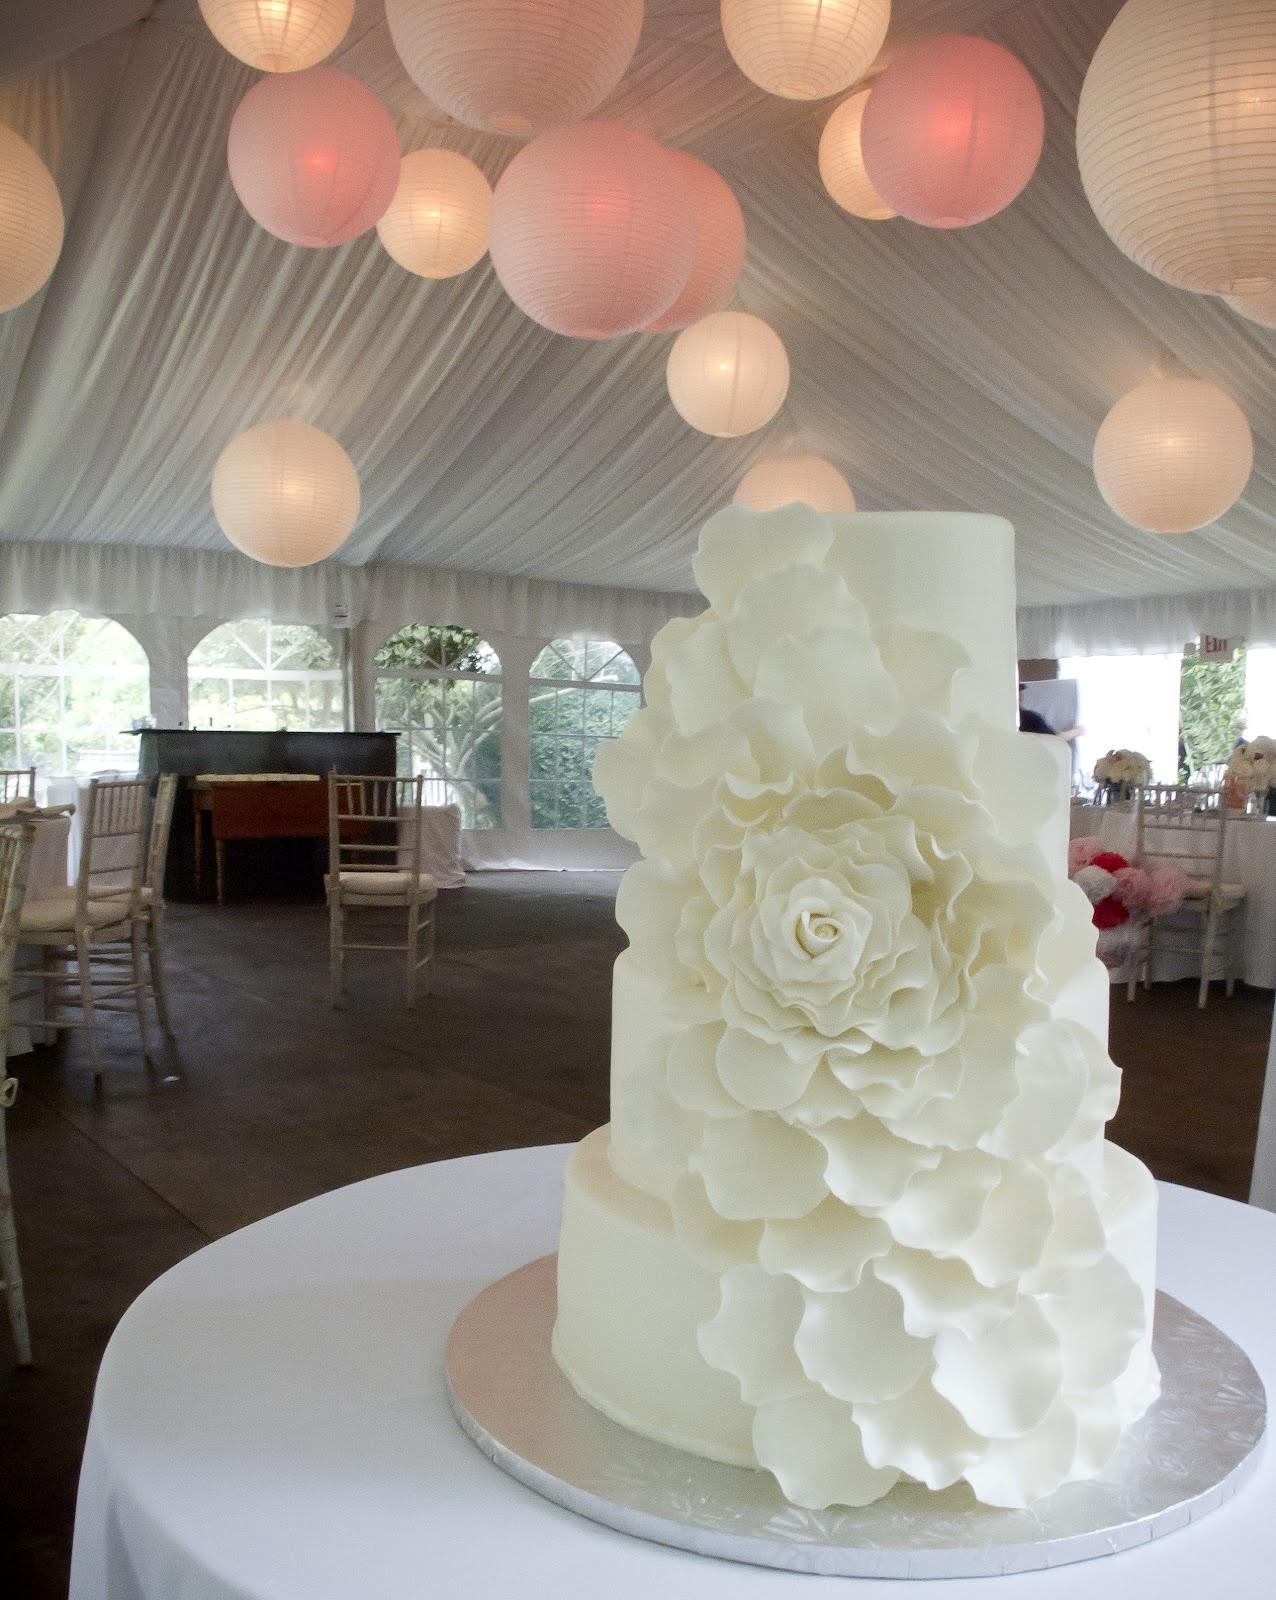 A Simple Cake Petal Wonderful White Wedding Cake